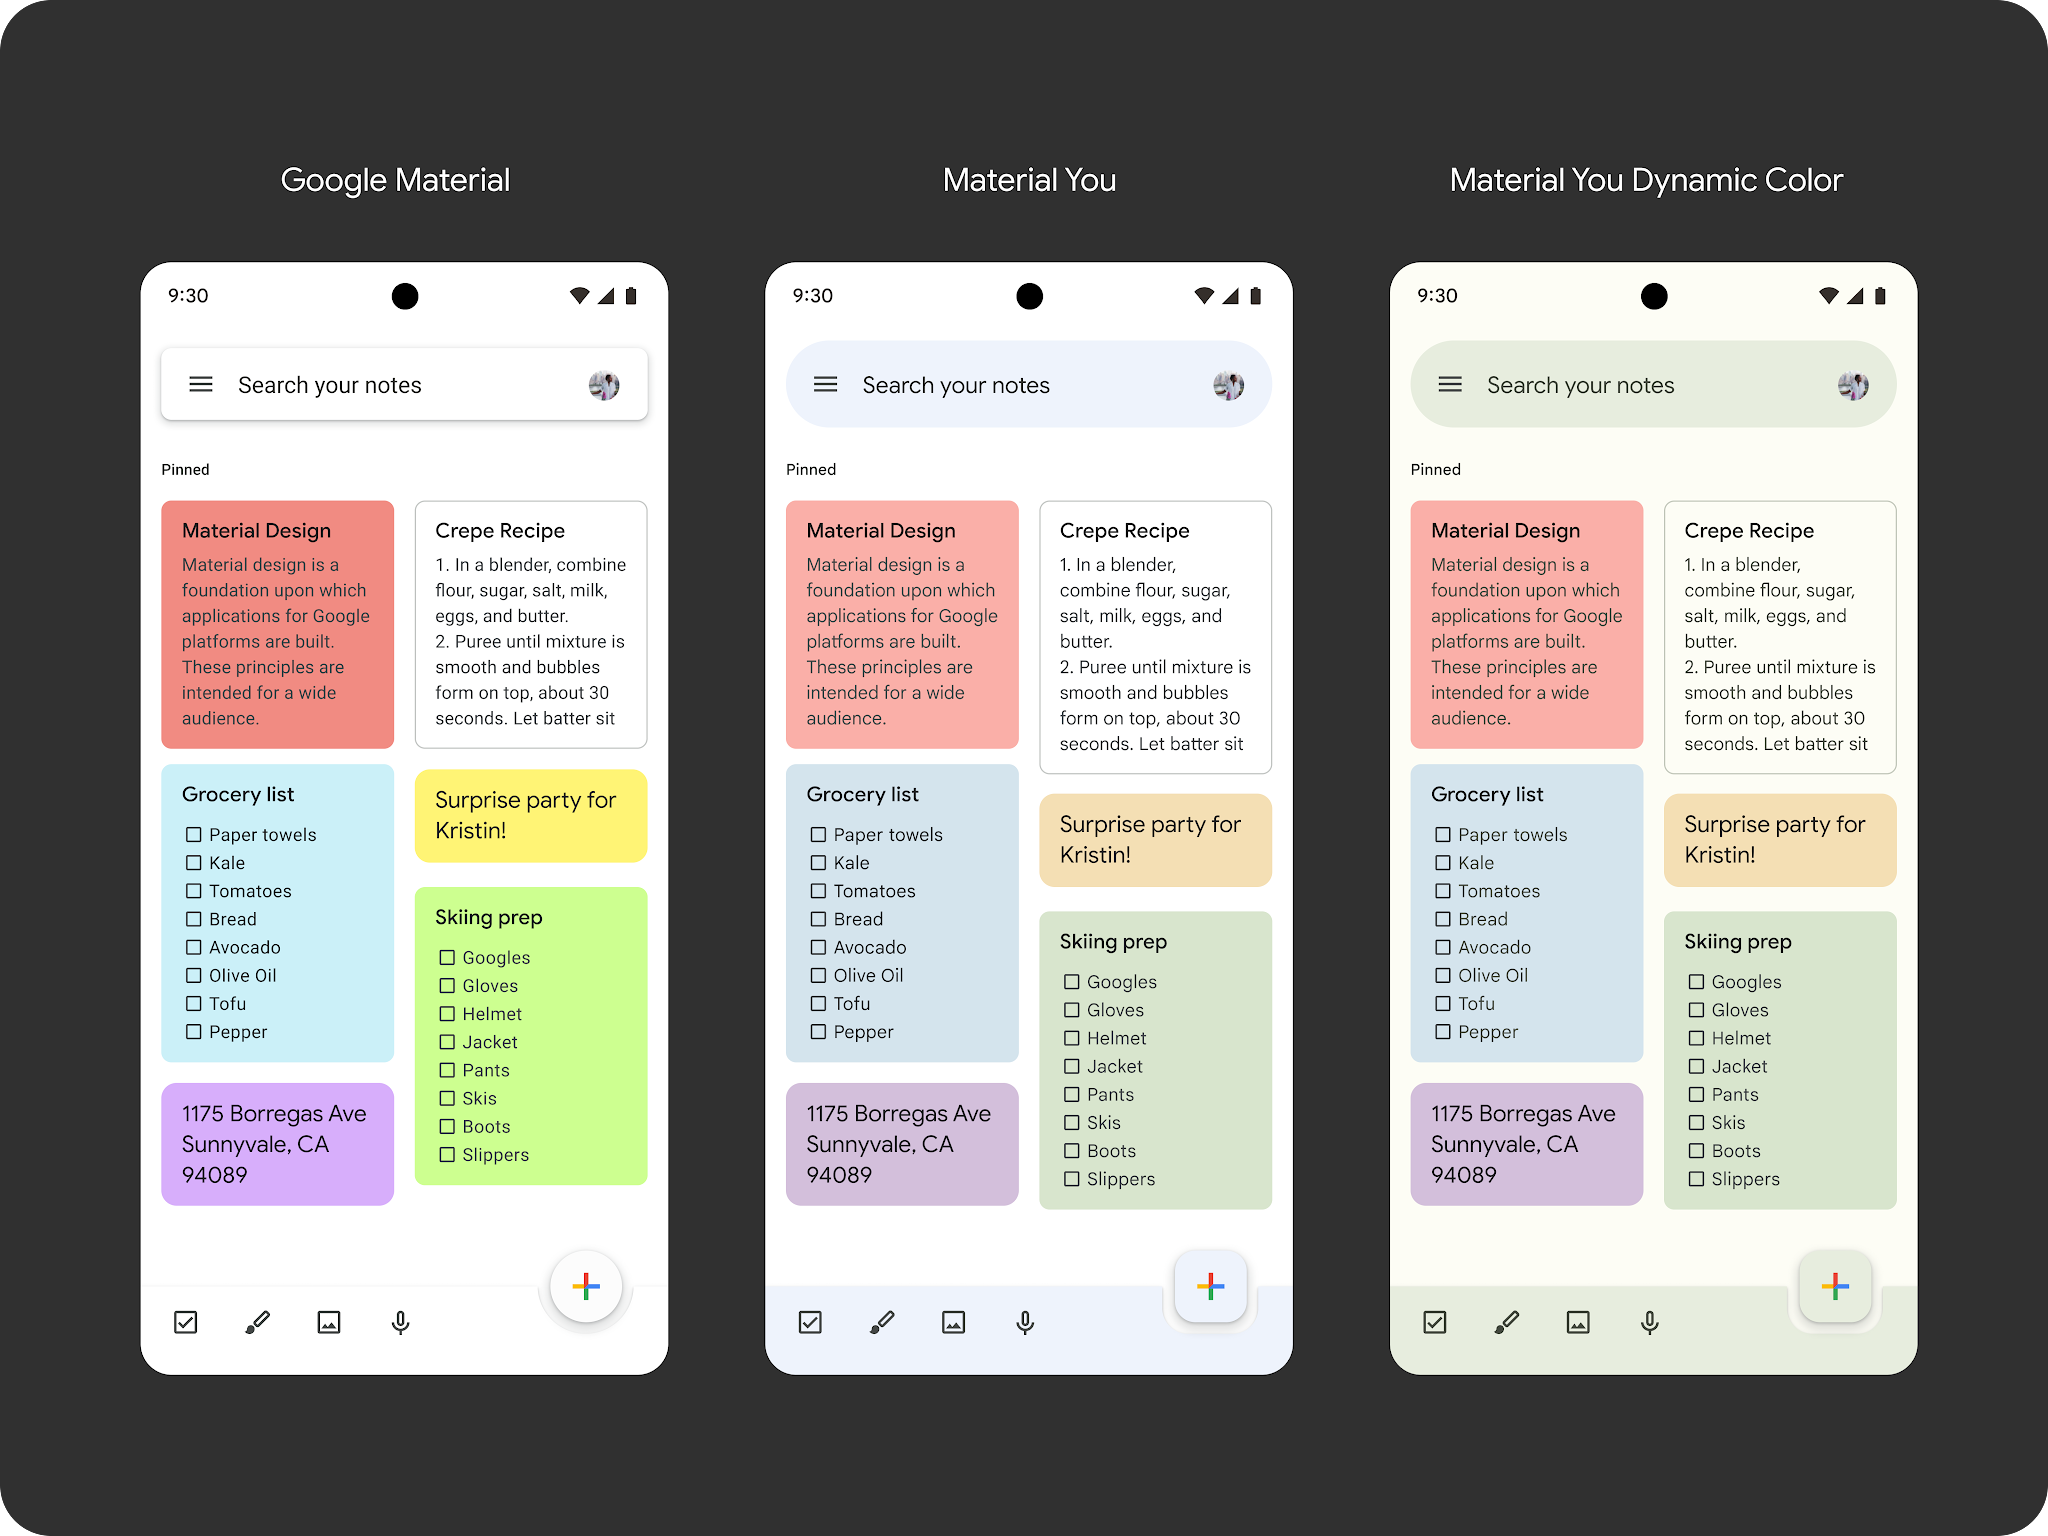 Material You - Google Keep